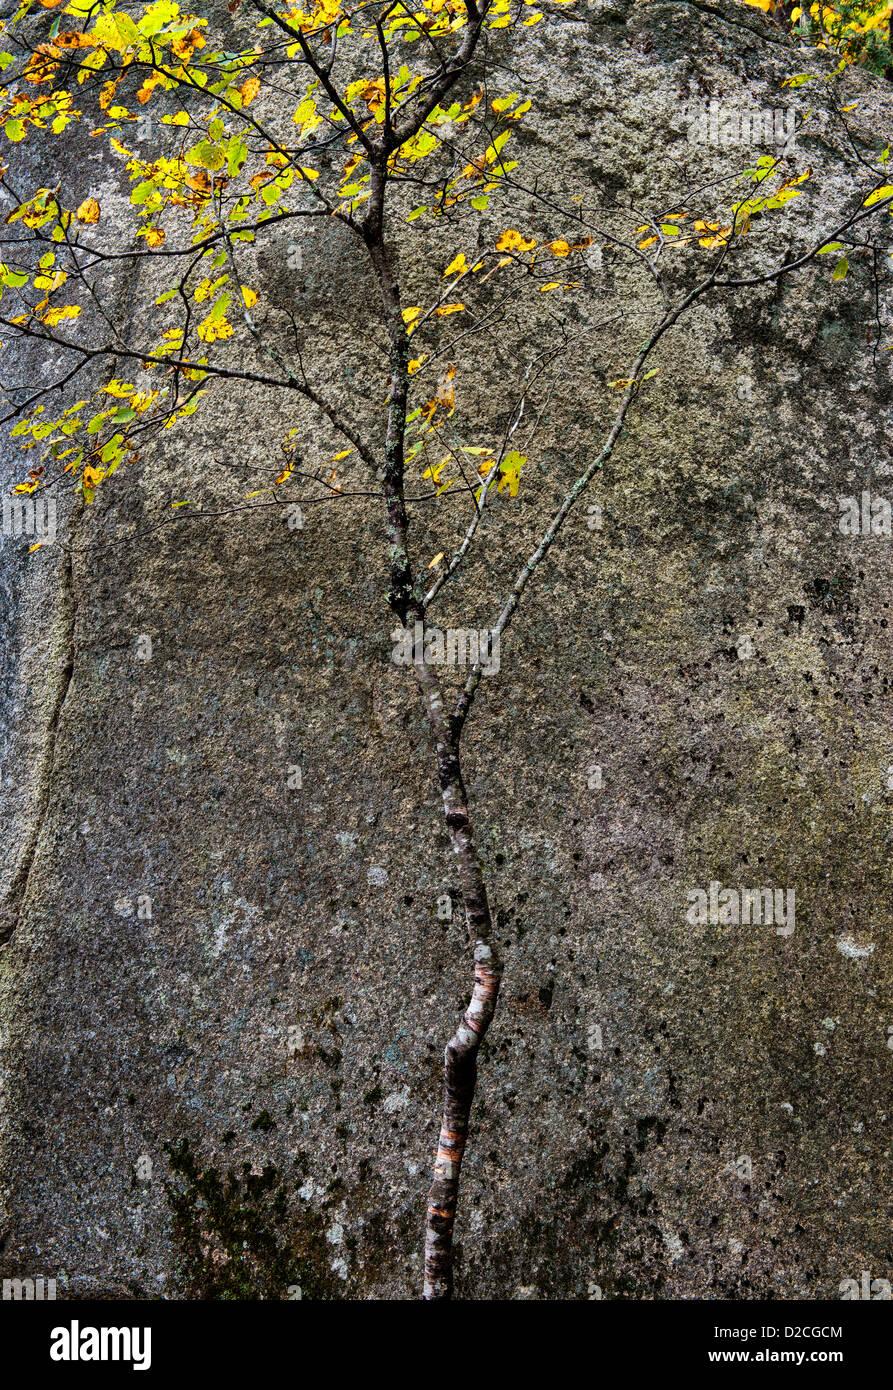 Autumn tree and granite, Acadia, Maine, USA - Stock Image